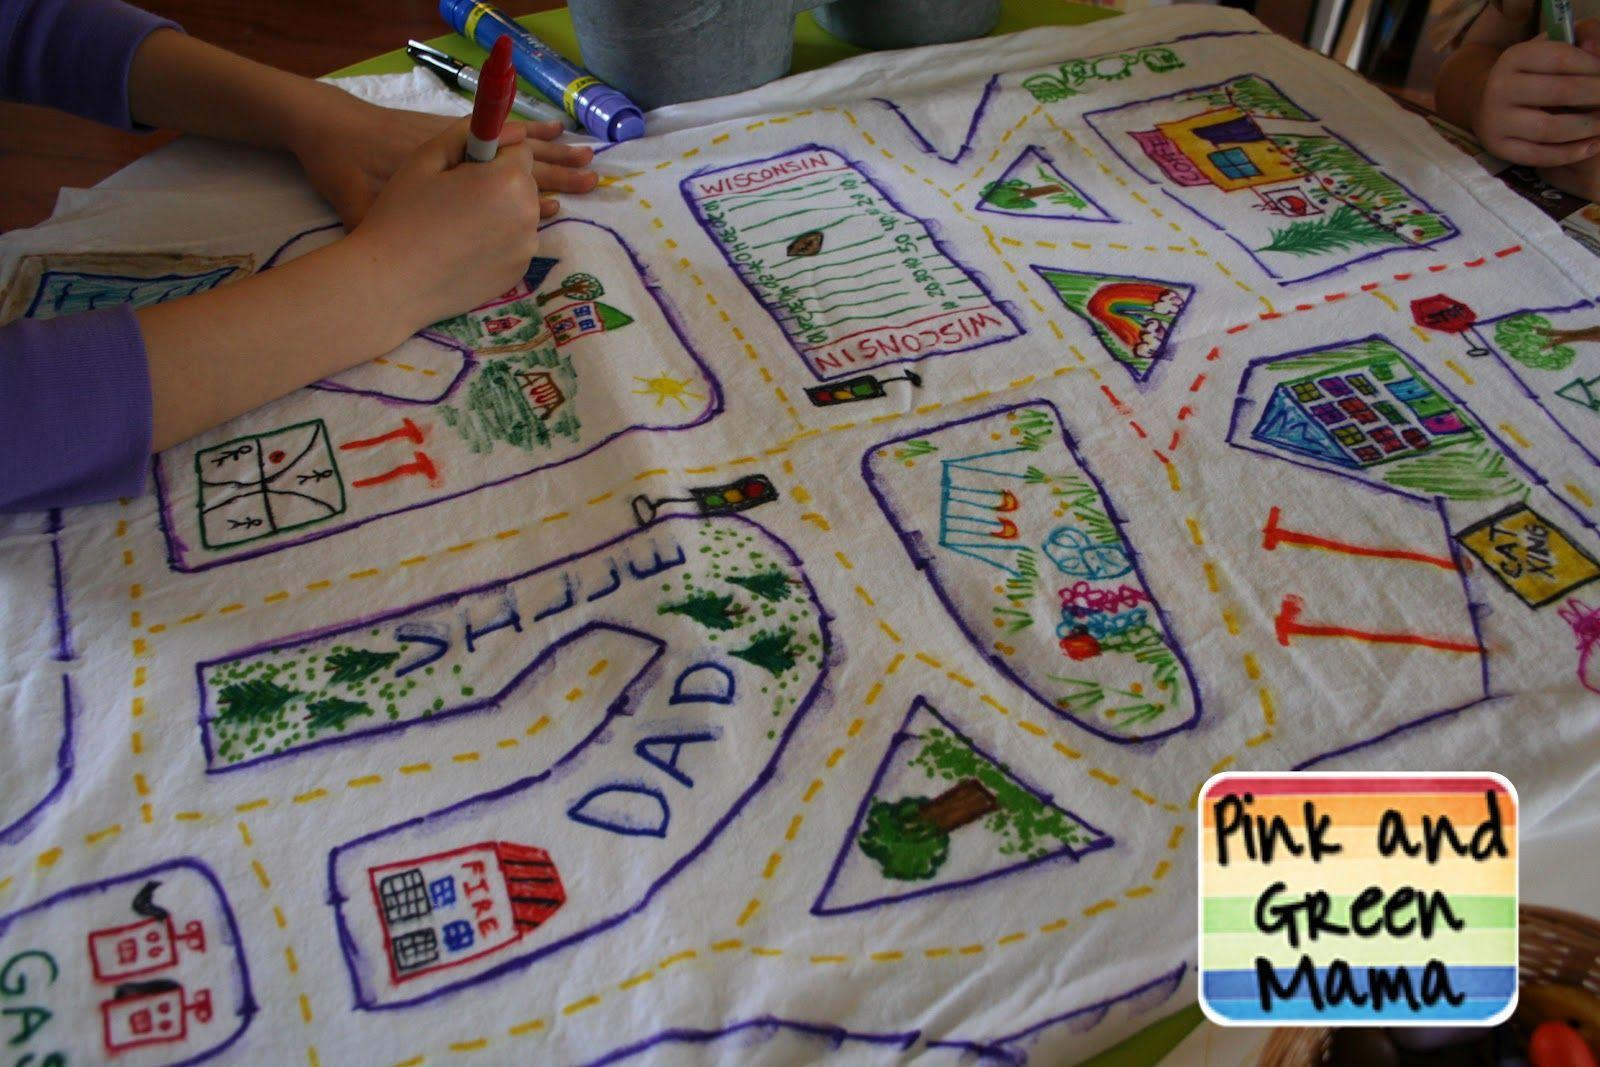 Pink and green mama dads homemade christmas gift surprise pink and green mama dads homemade christmas gift surprise back massage solutioingenieria Images